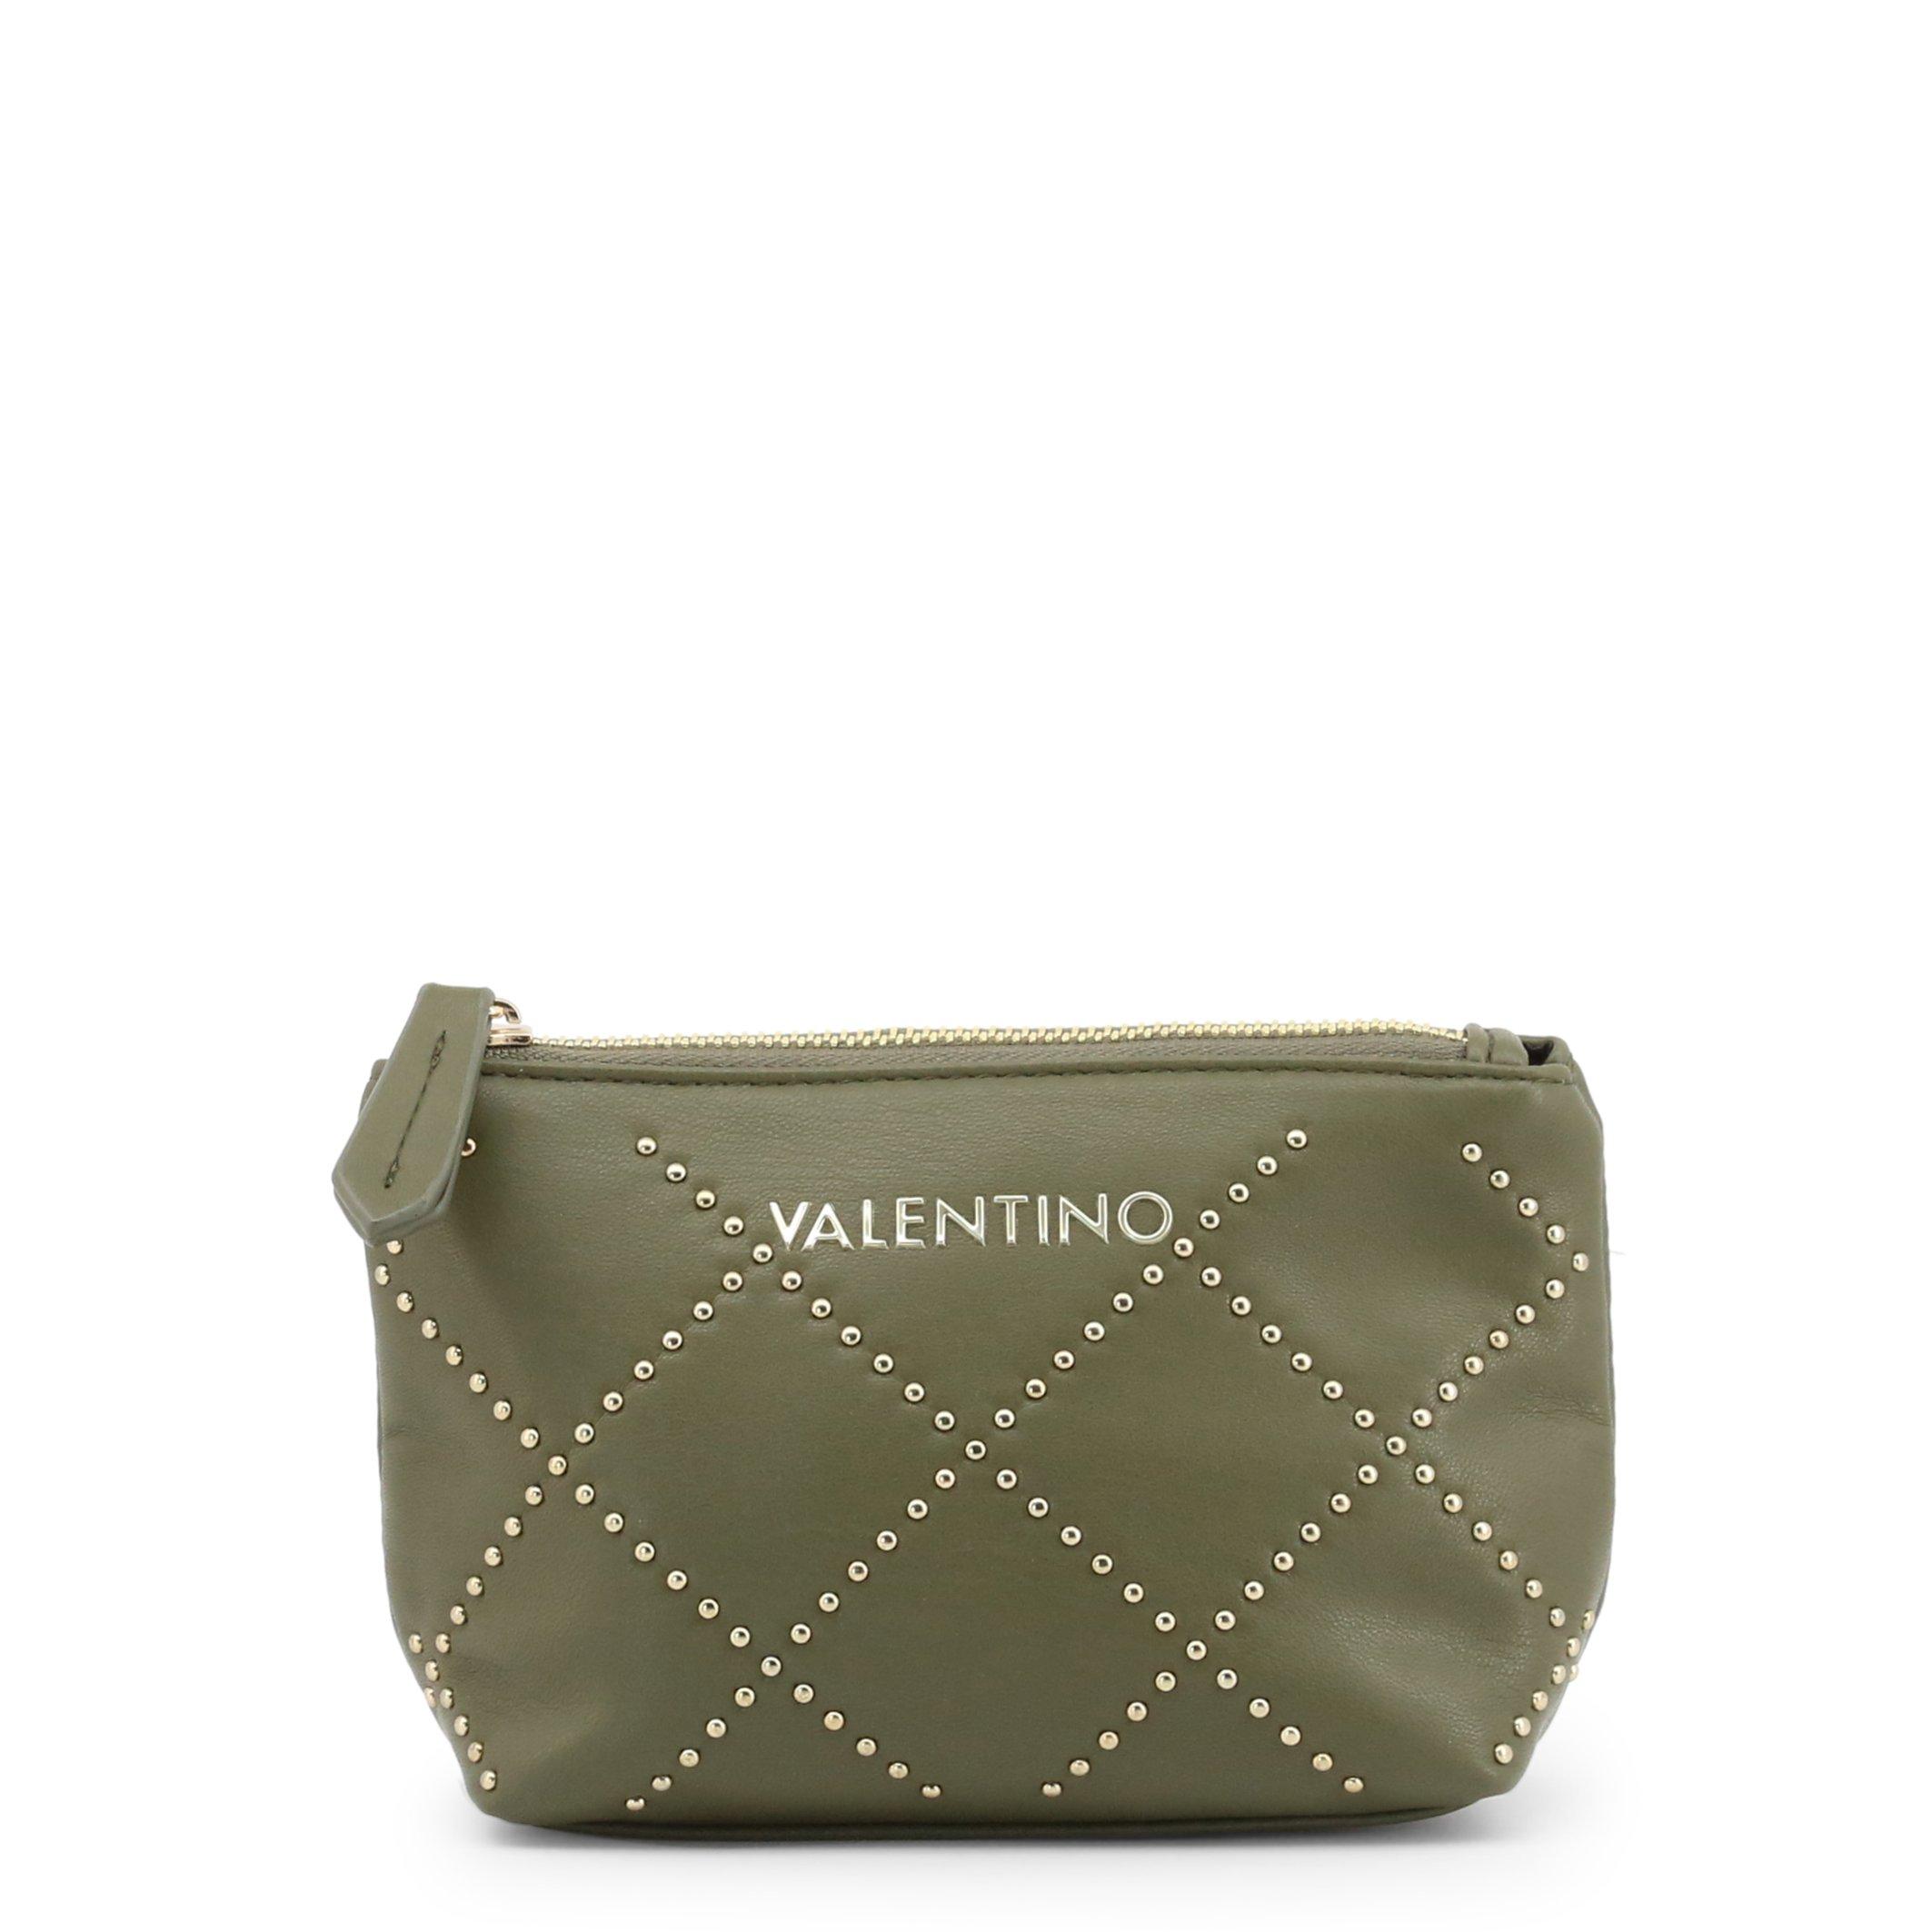 Valentino by Mario Valentino Women's Clutch Bag Various Colours MANDOLINO-VBE3KI513 - green-1 NOSIZE